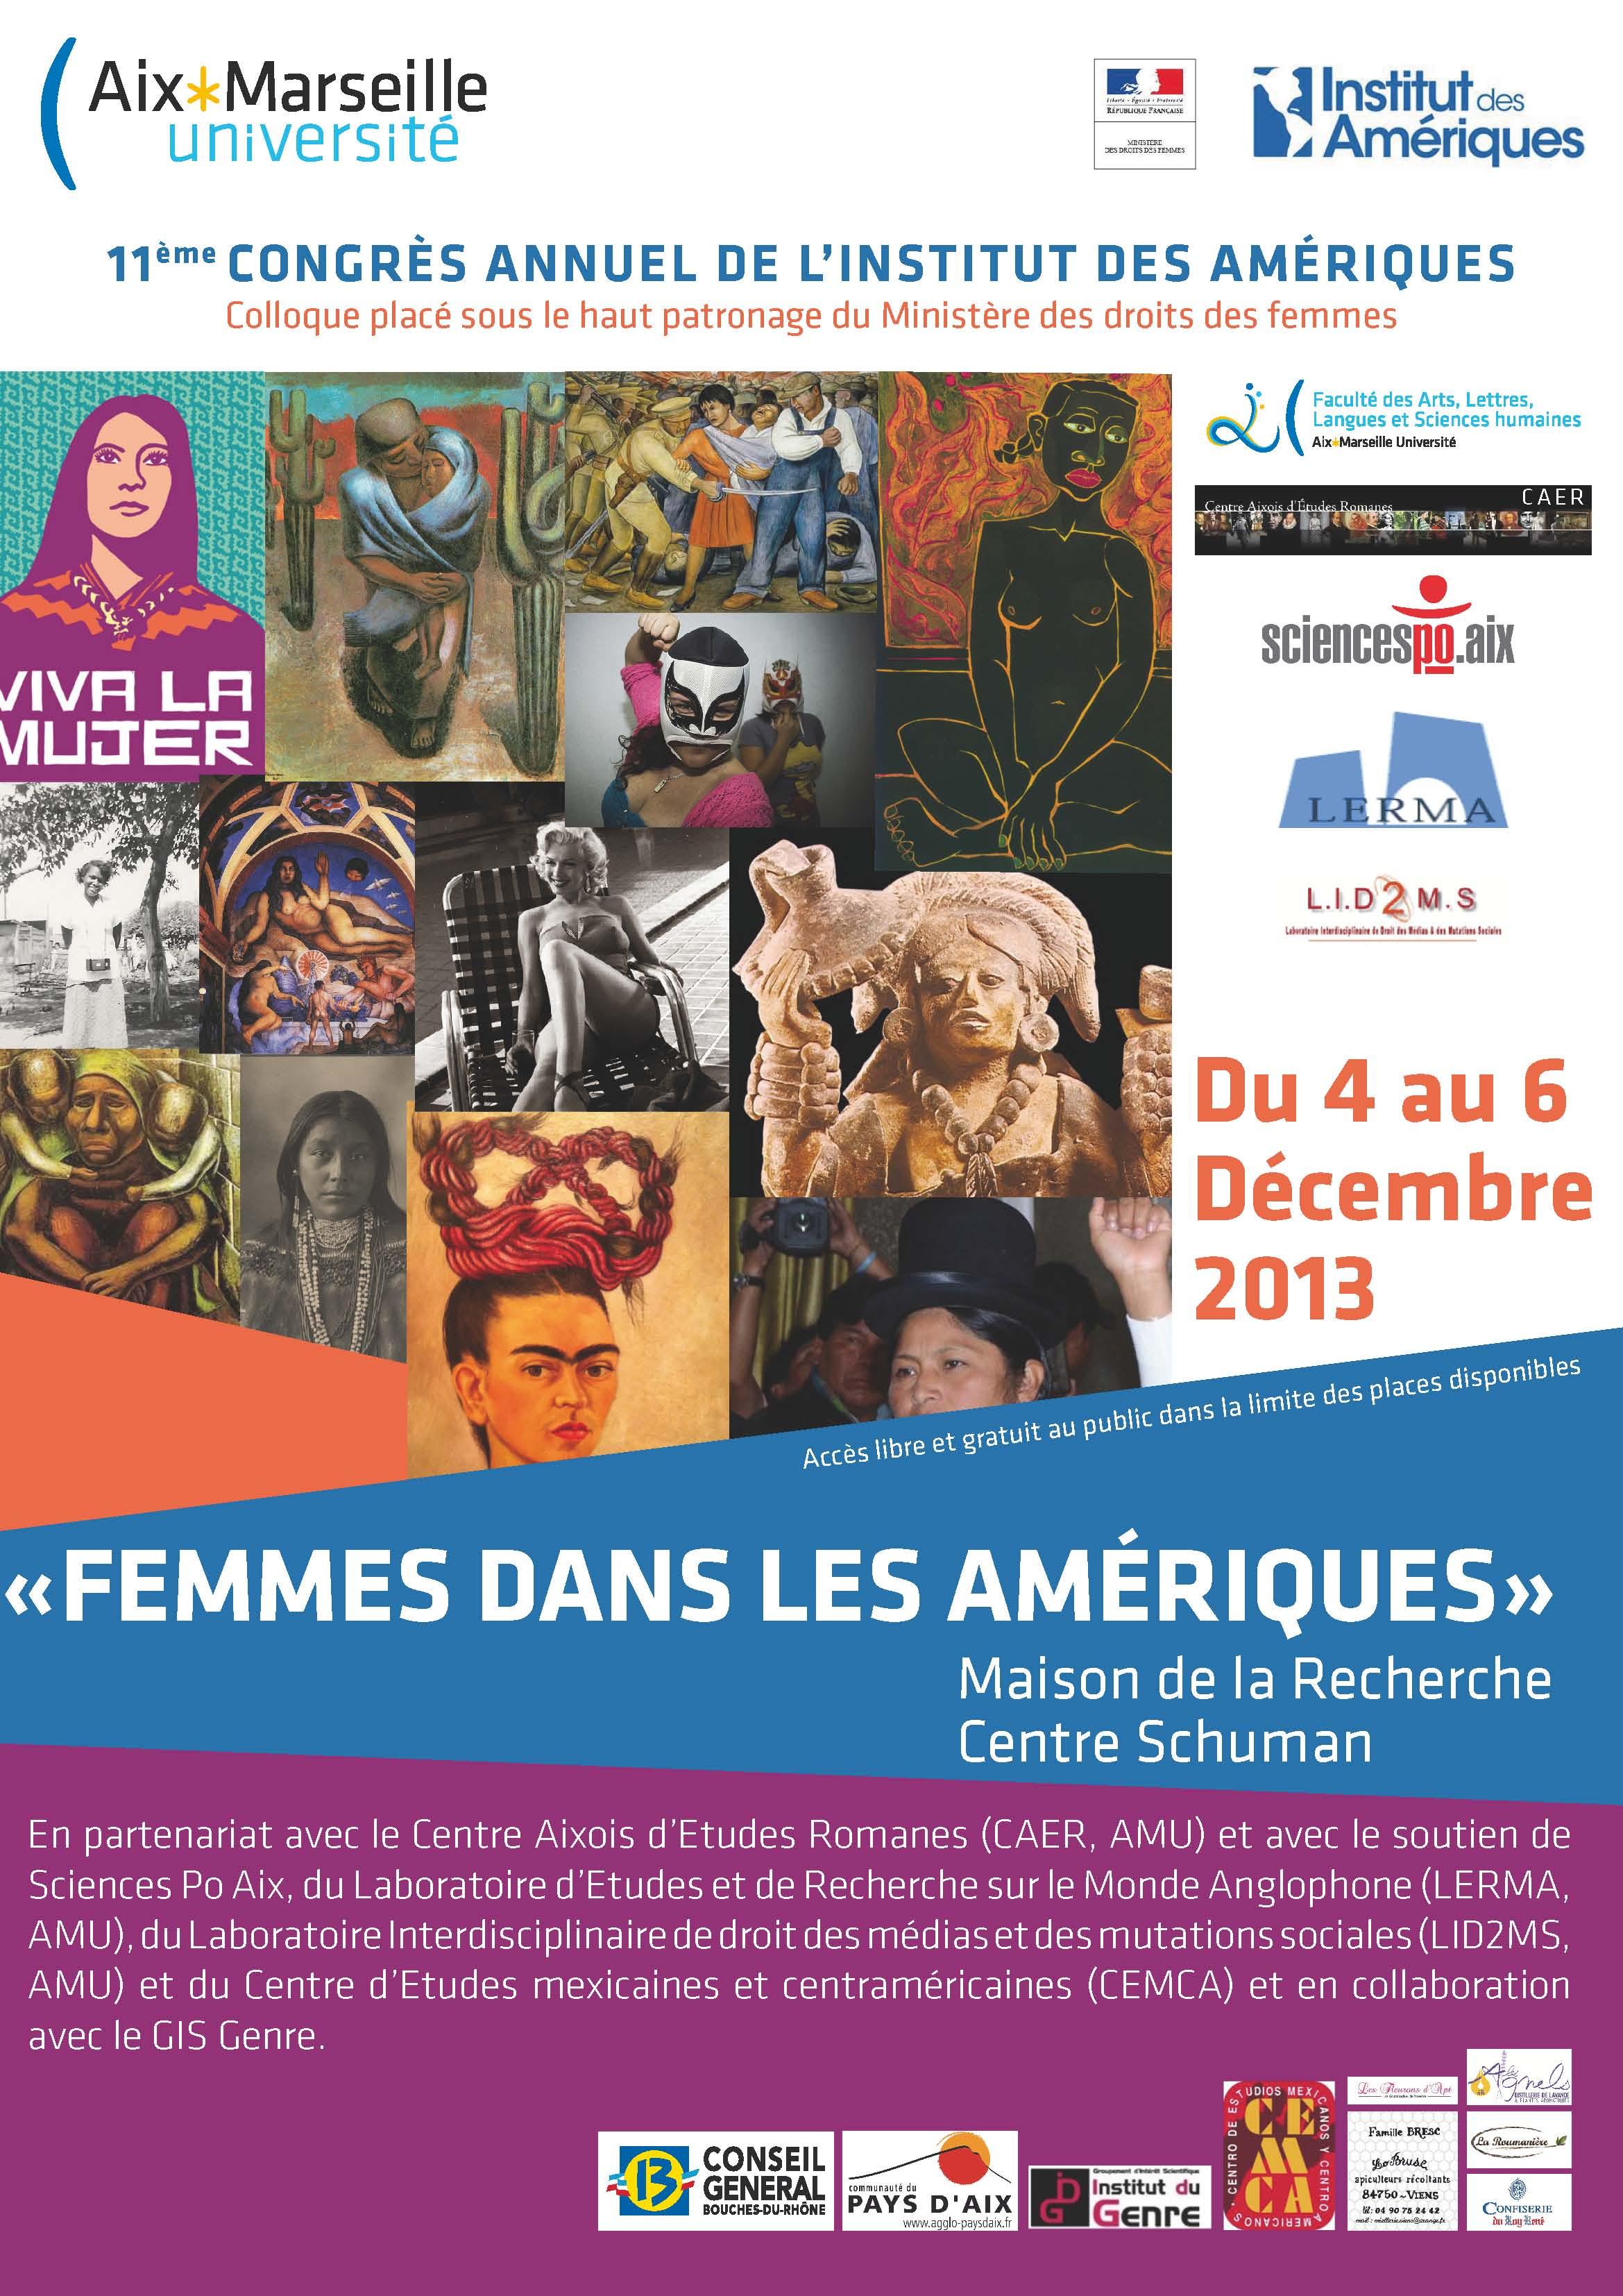 AFFICHE_BAT_FEMMES